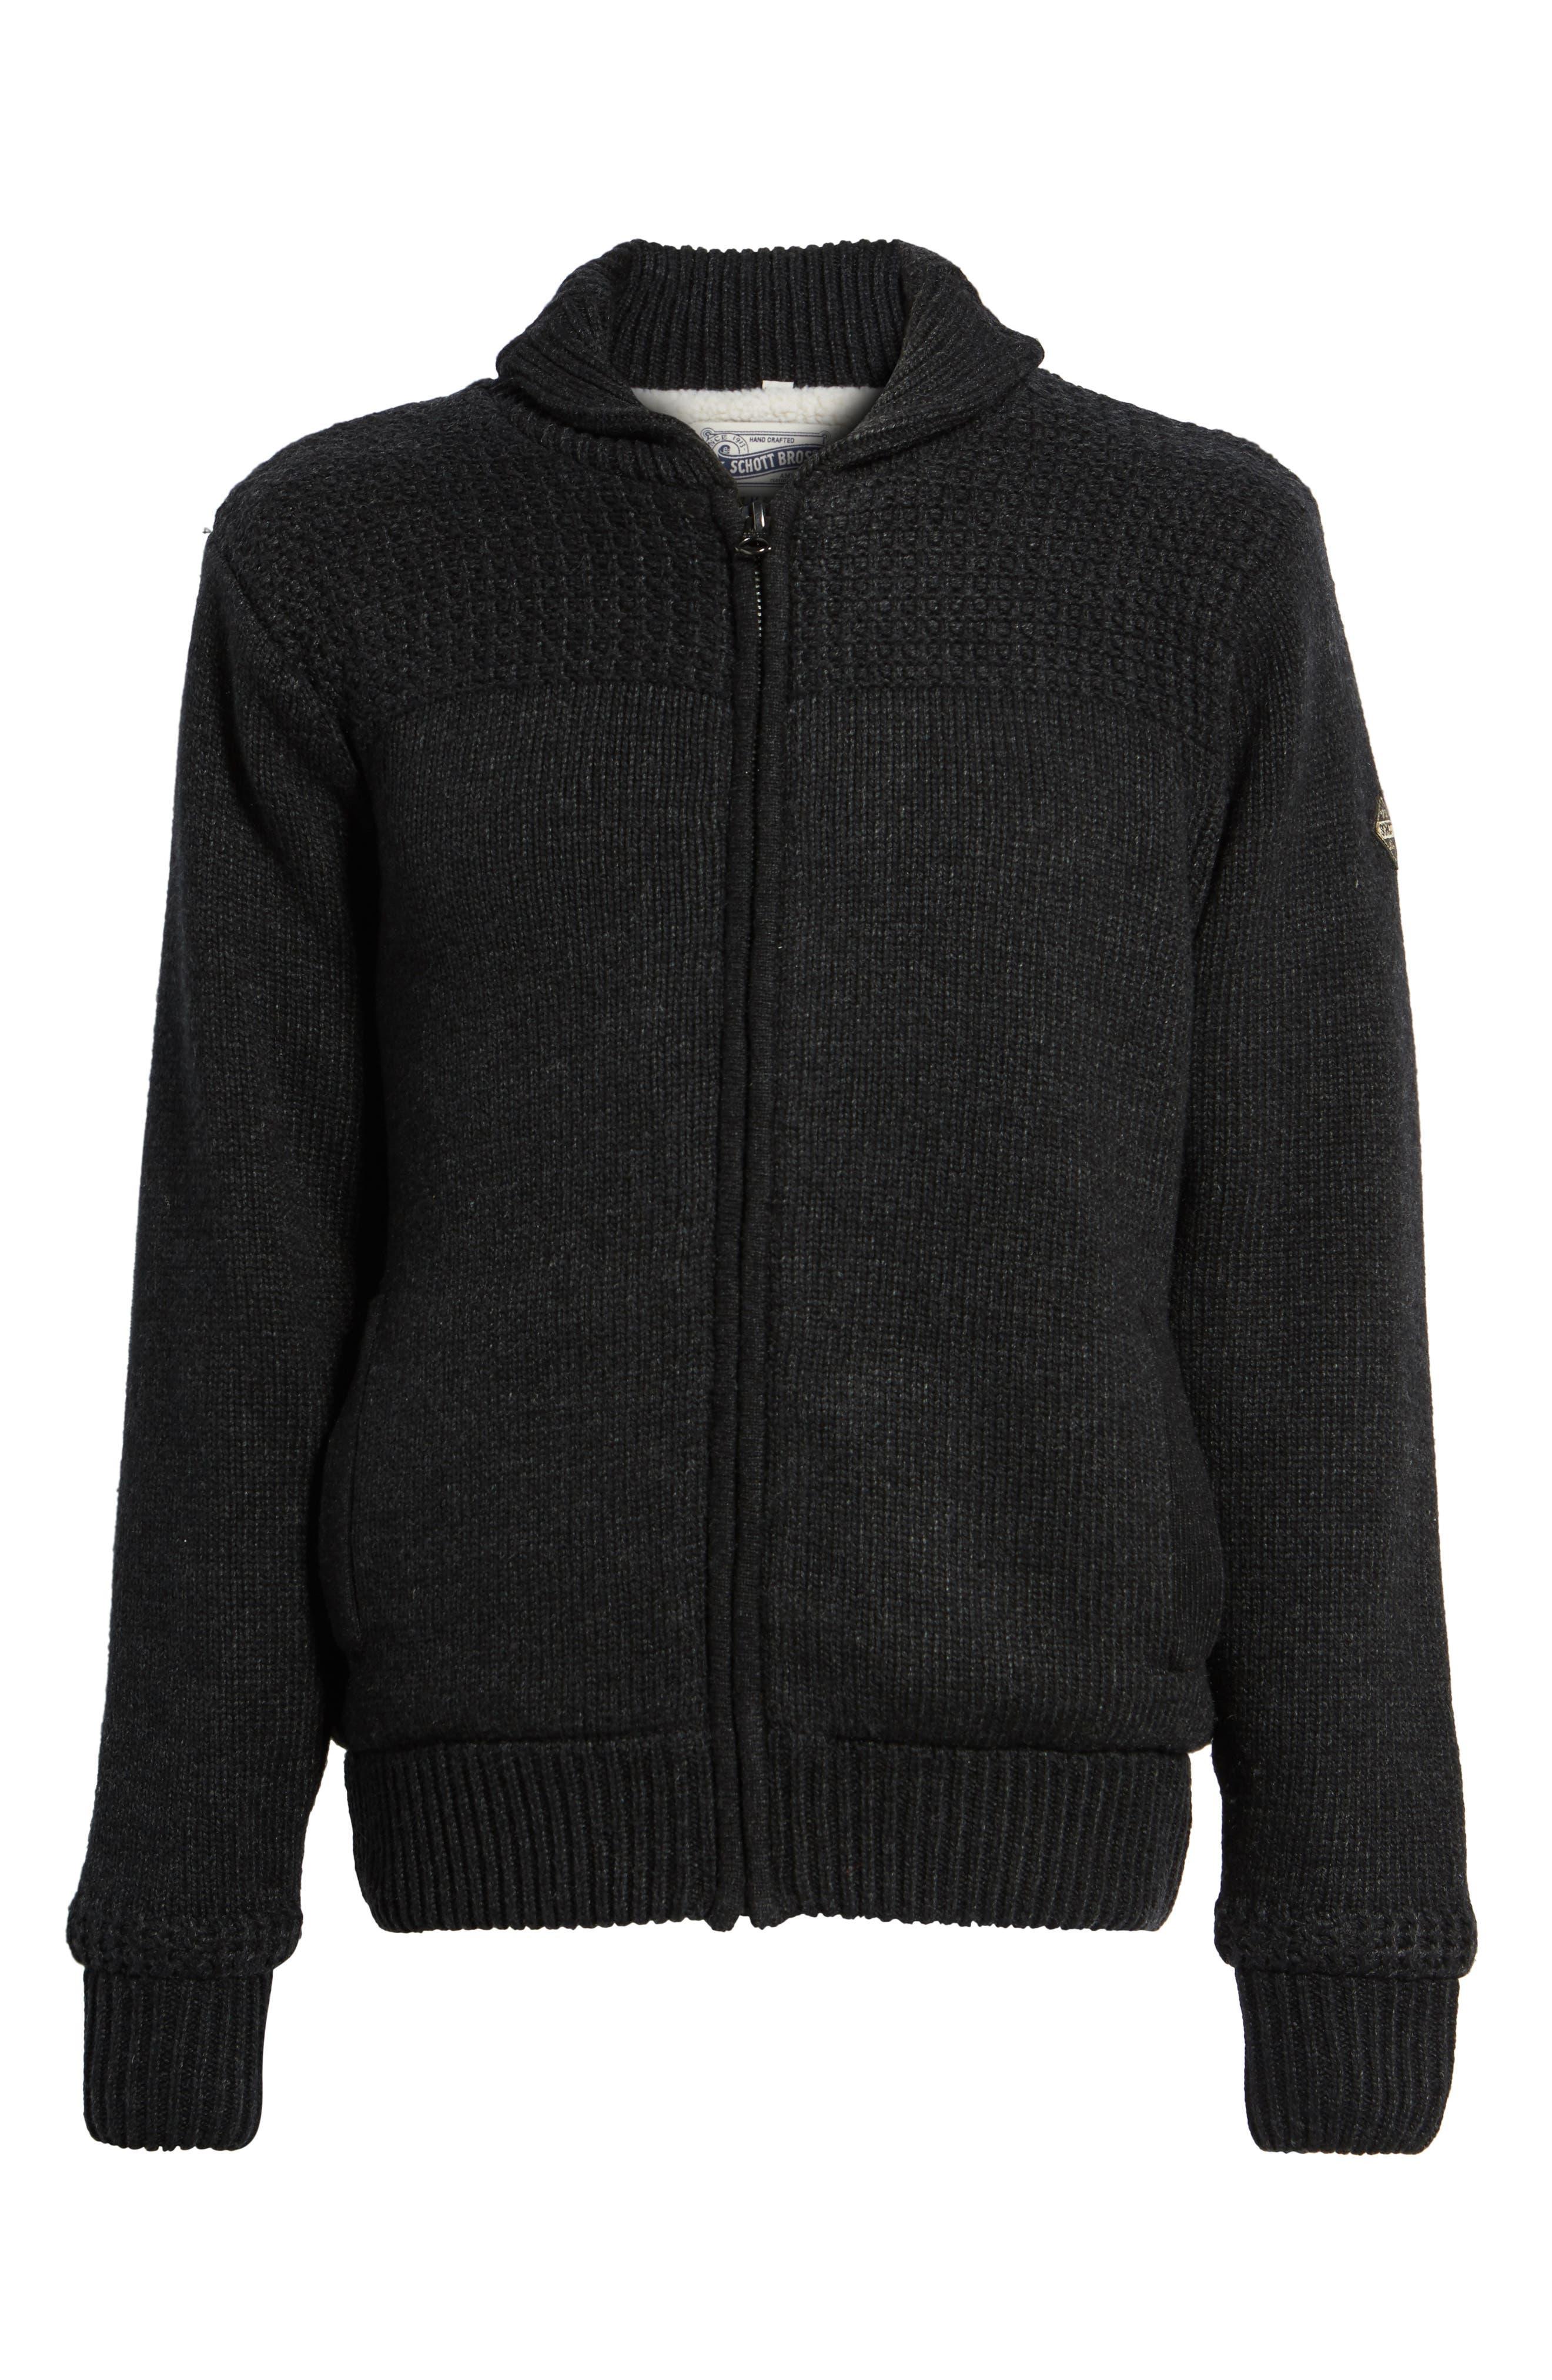 SCHOTT NYC,                             Lined Wool Zip Sweater,                             Alternate thumbnail 6, color,                             BLACK